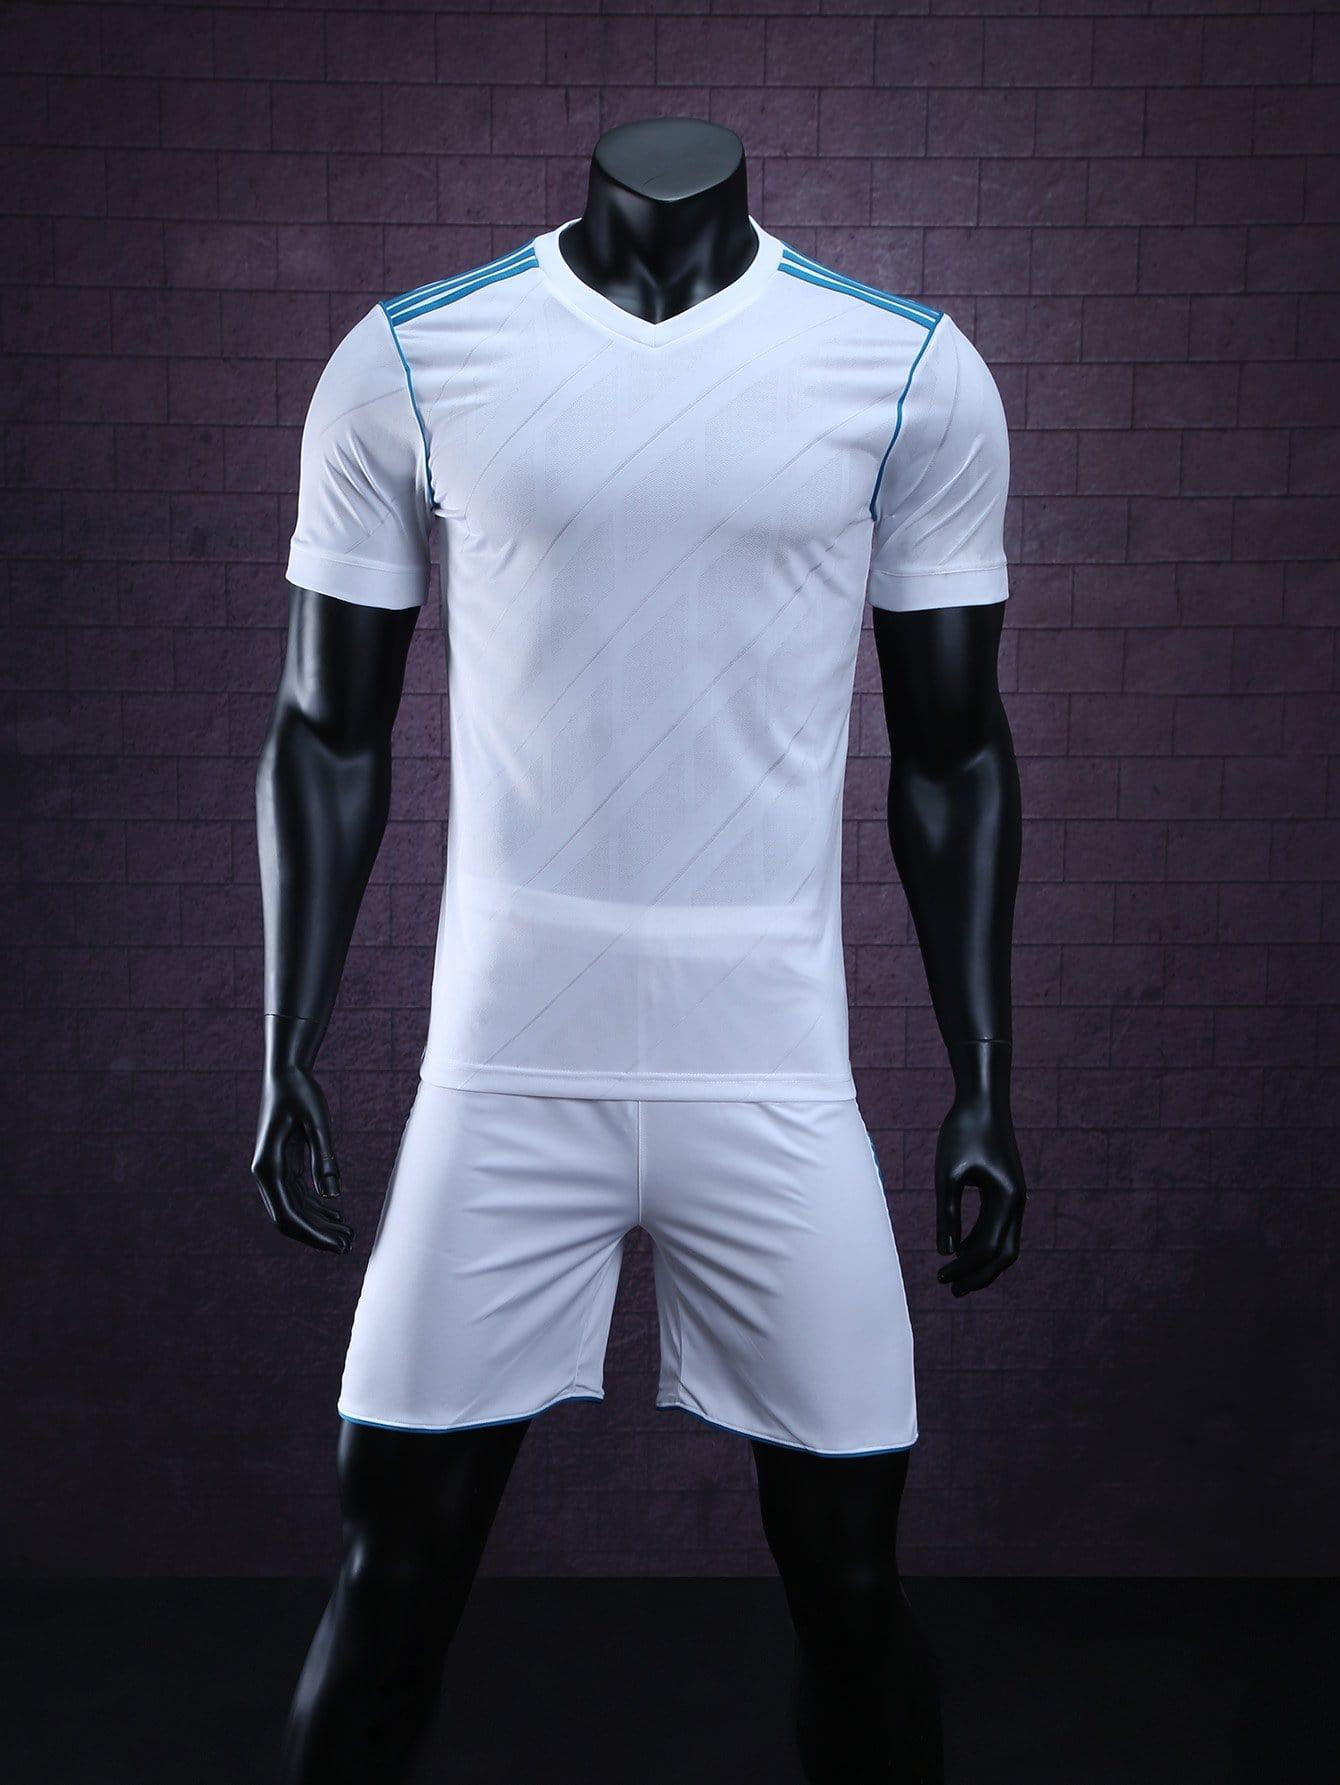 Men Real Madrid F.C. Host Team T-Shirt With Shorts tryp madrid centro ex tryp washington 3 мадрид